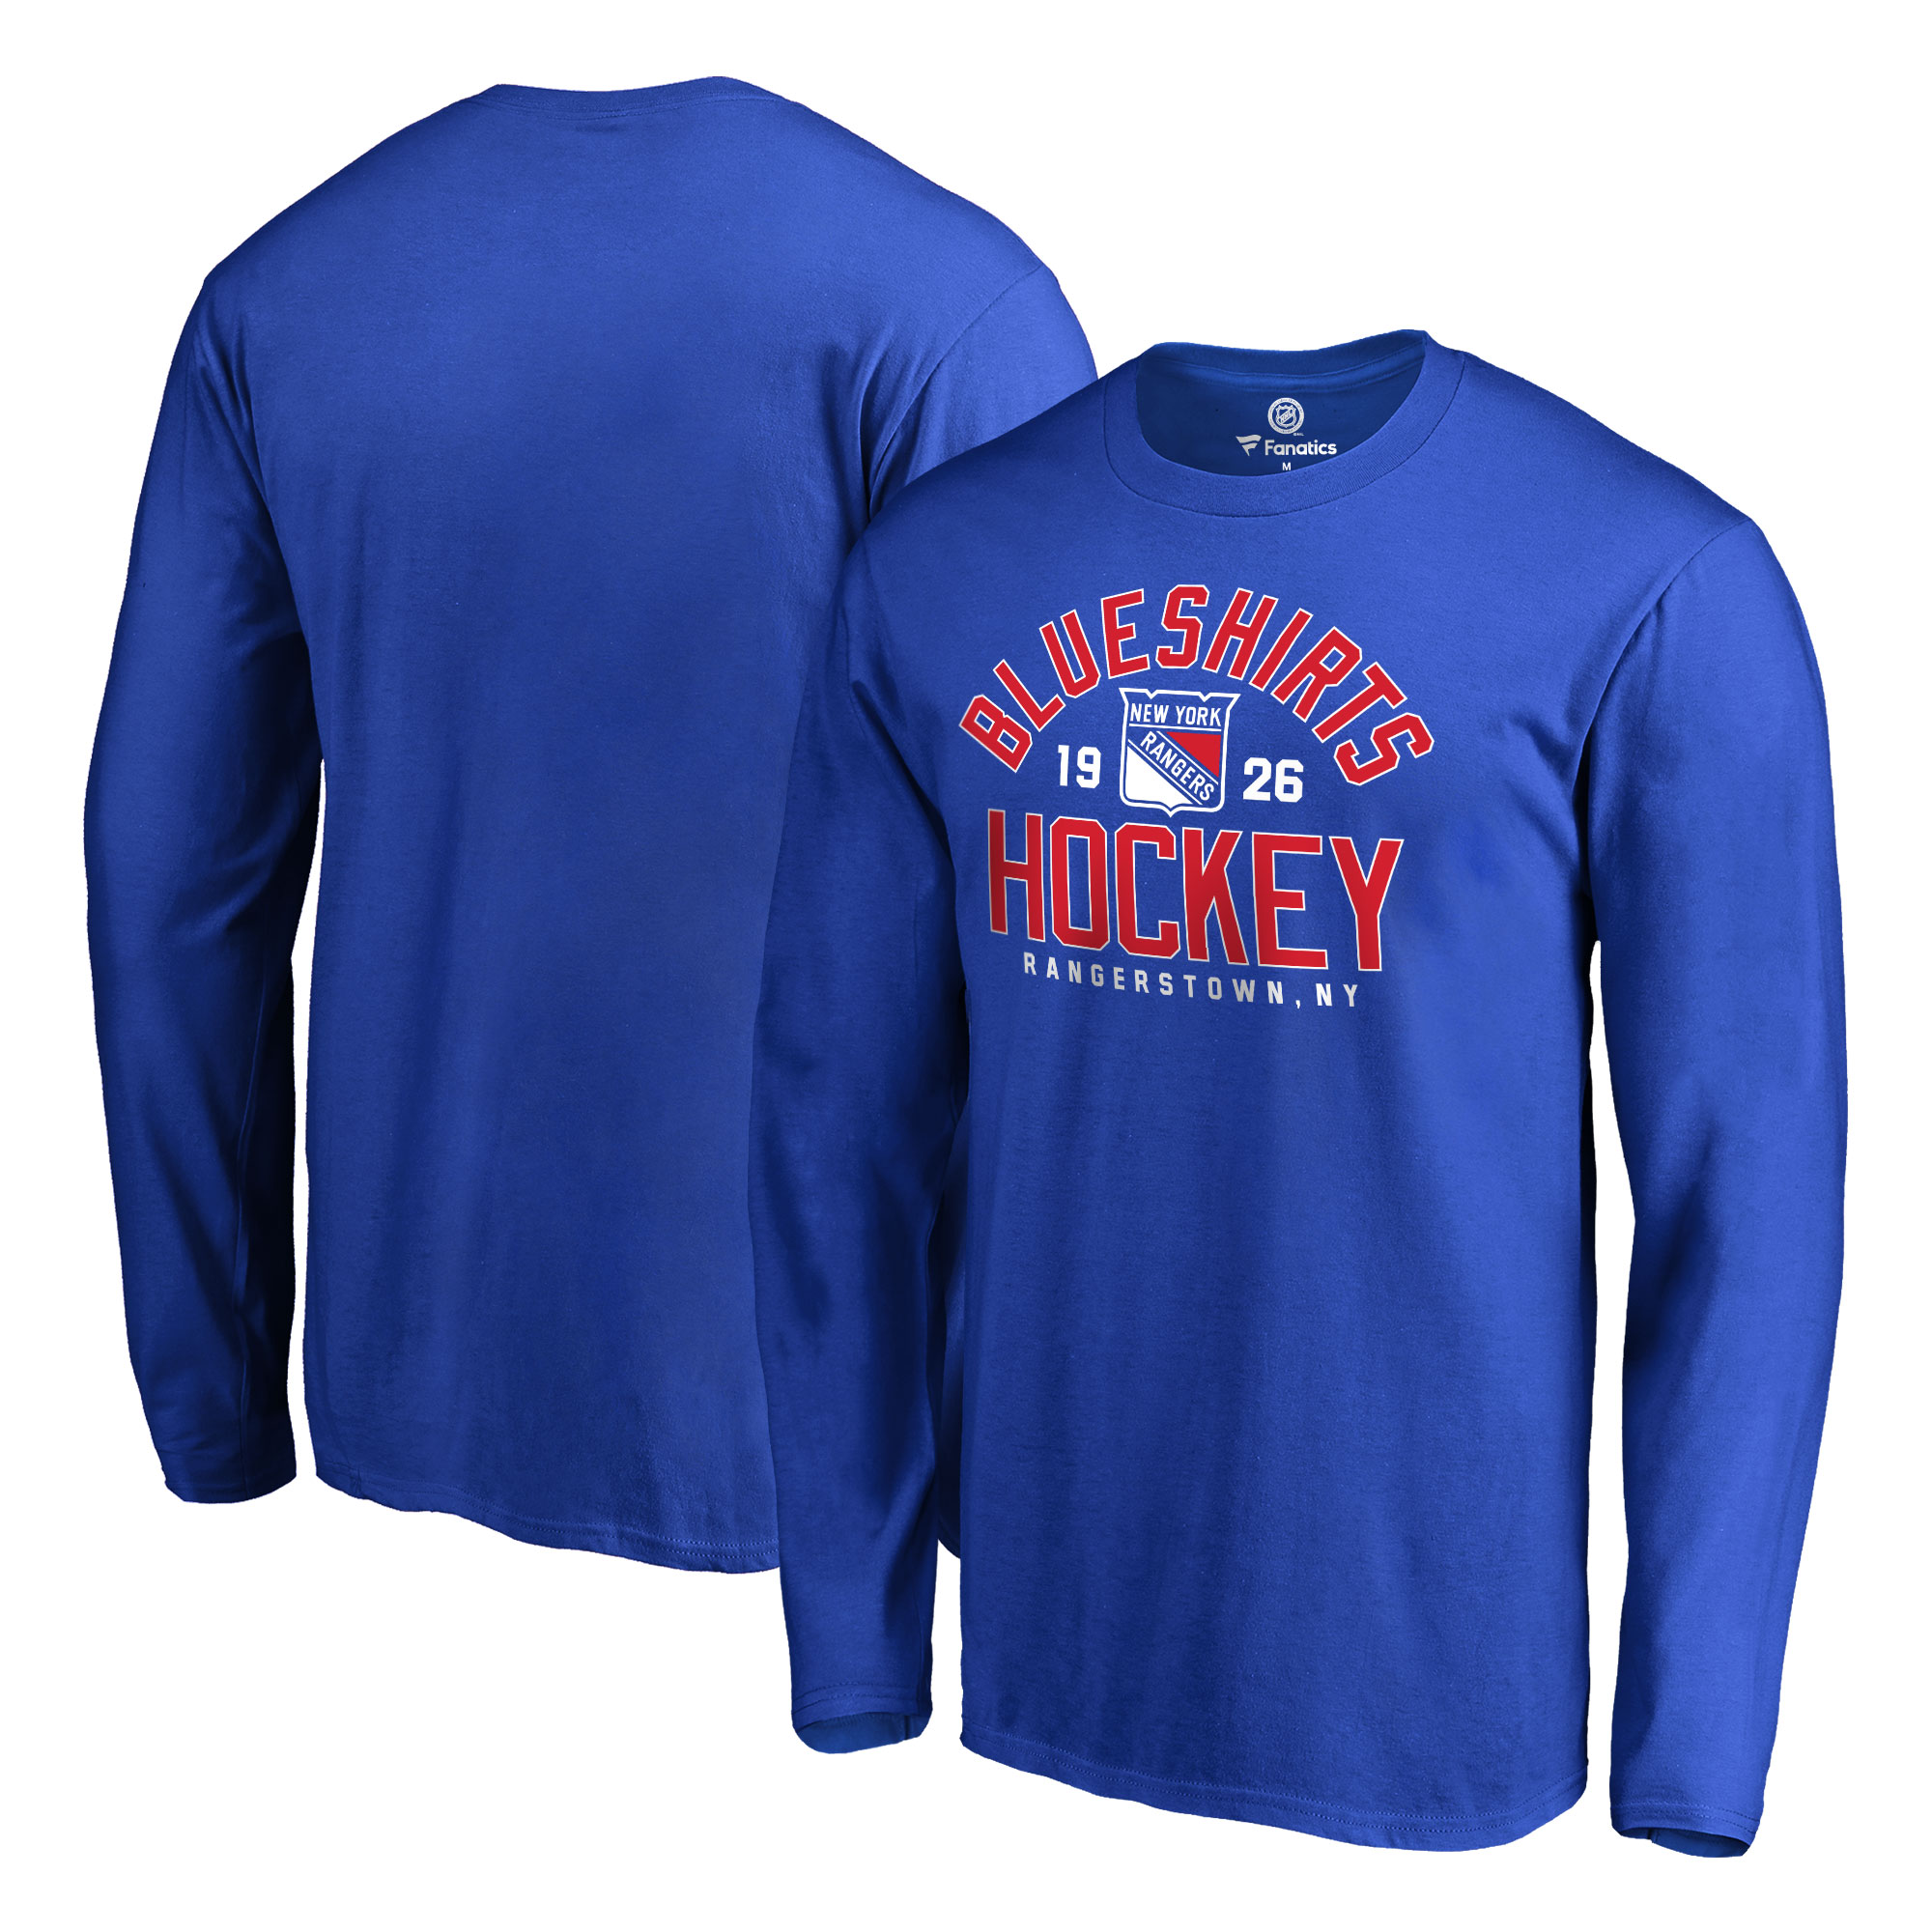 New York Rangers Fanatics Branded Hometown Collection Blueshirts Long Sleeve T-Shirt - Royal